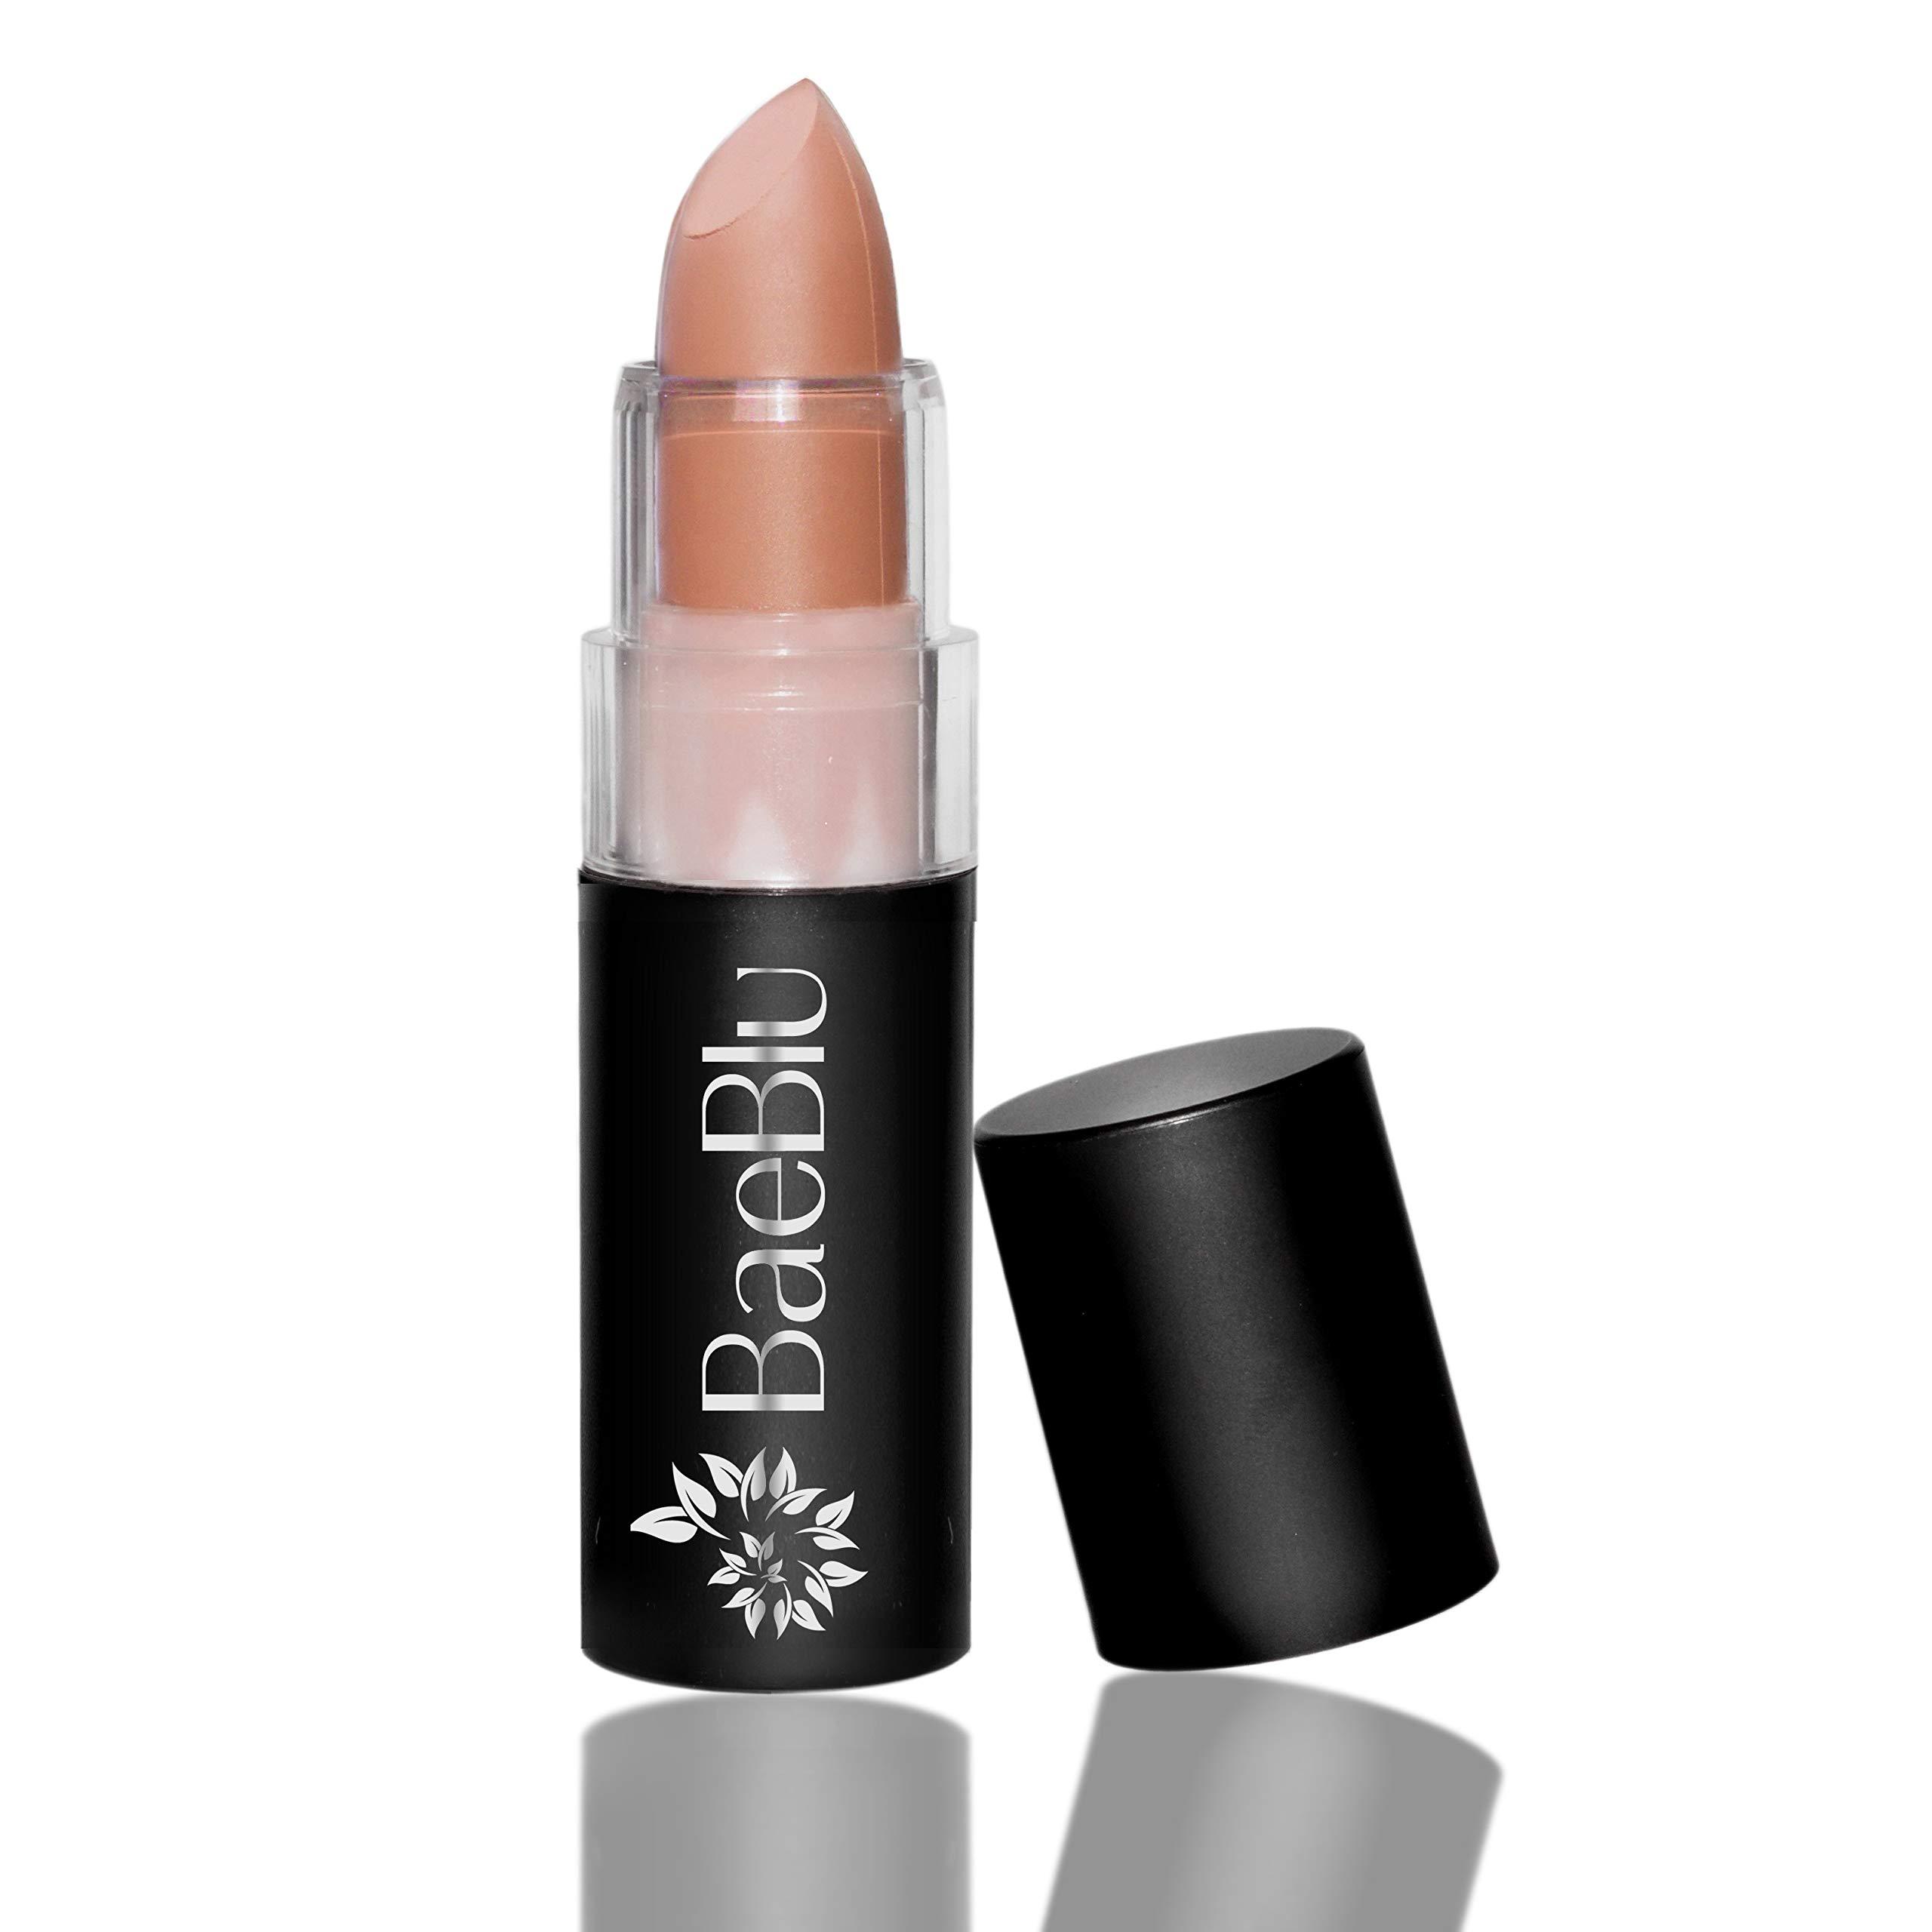 BaeBlu Organic Lipstick 100% Natural Hydrating Antioxidant-Rich, Made in USA, Matte Feelin' Peachy